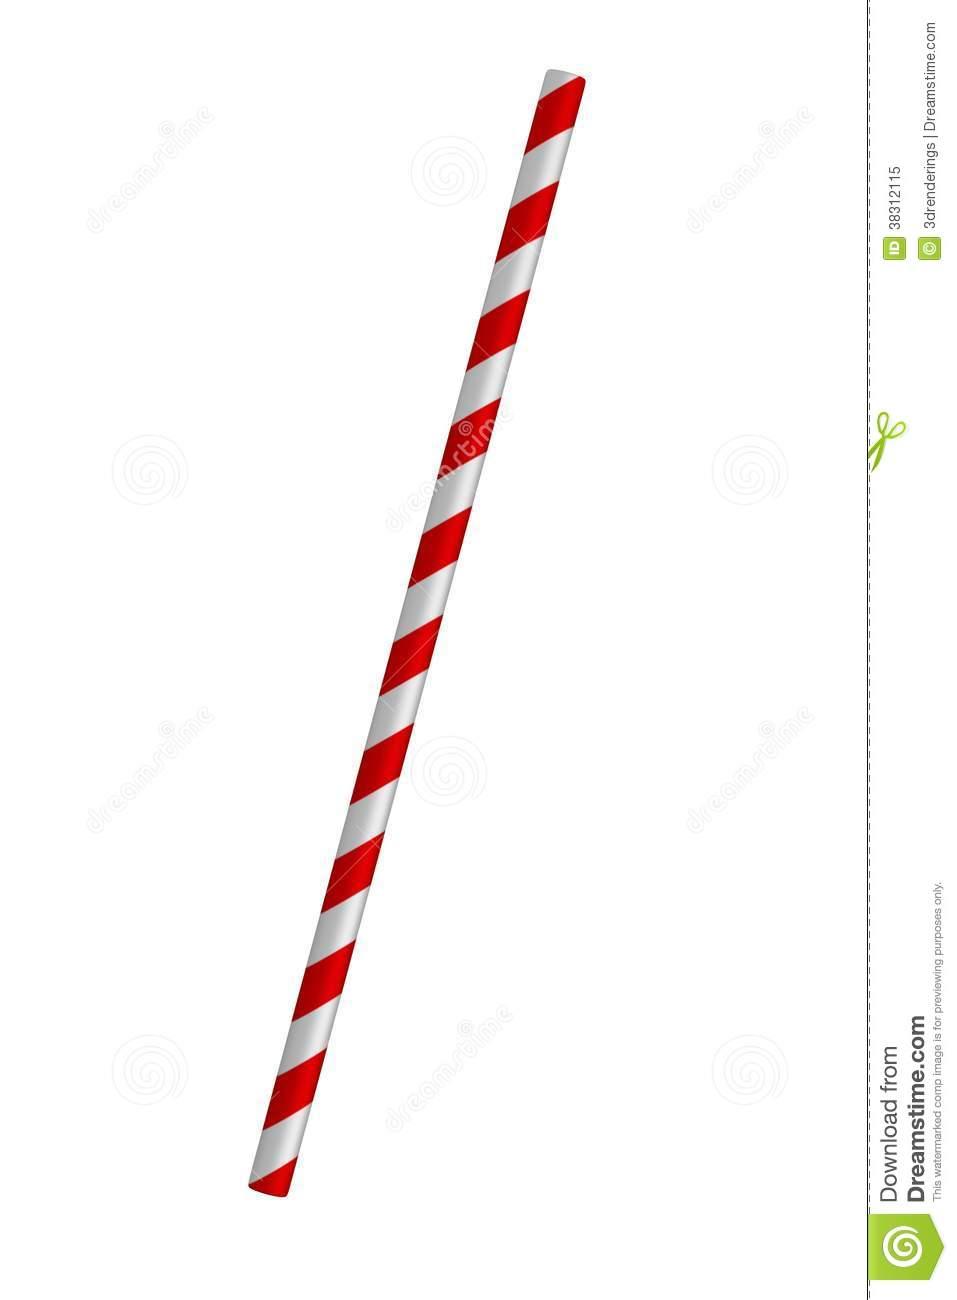 Straw clipart #11